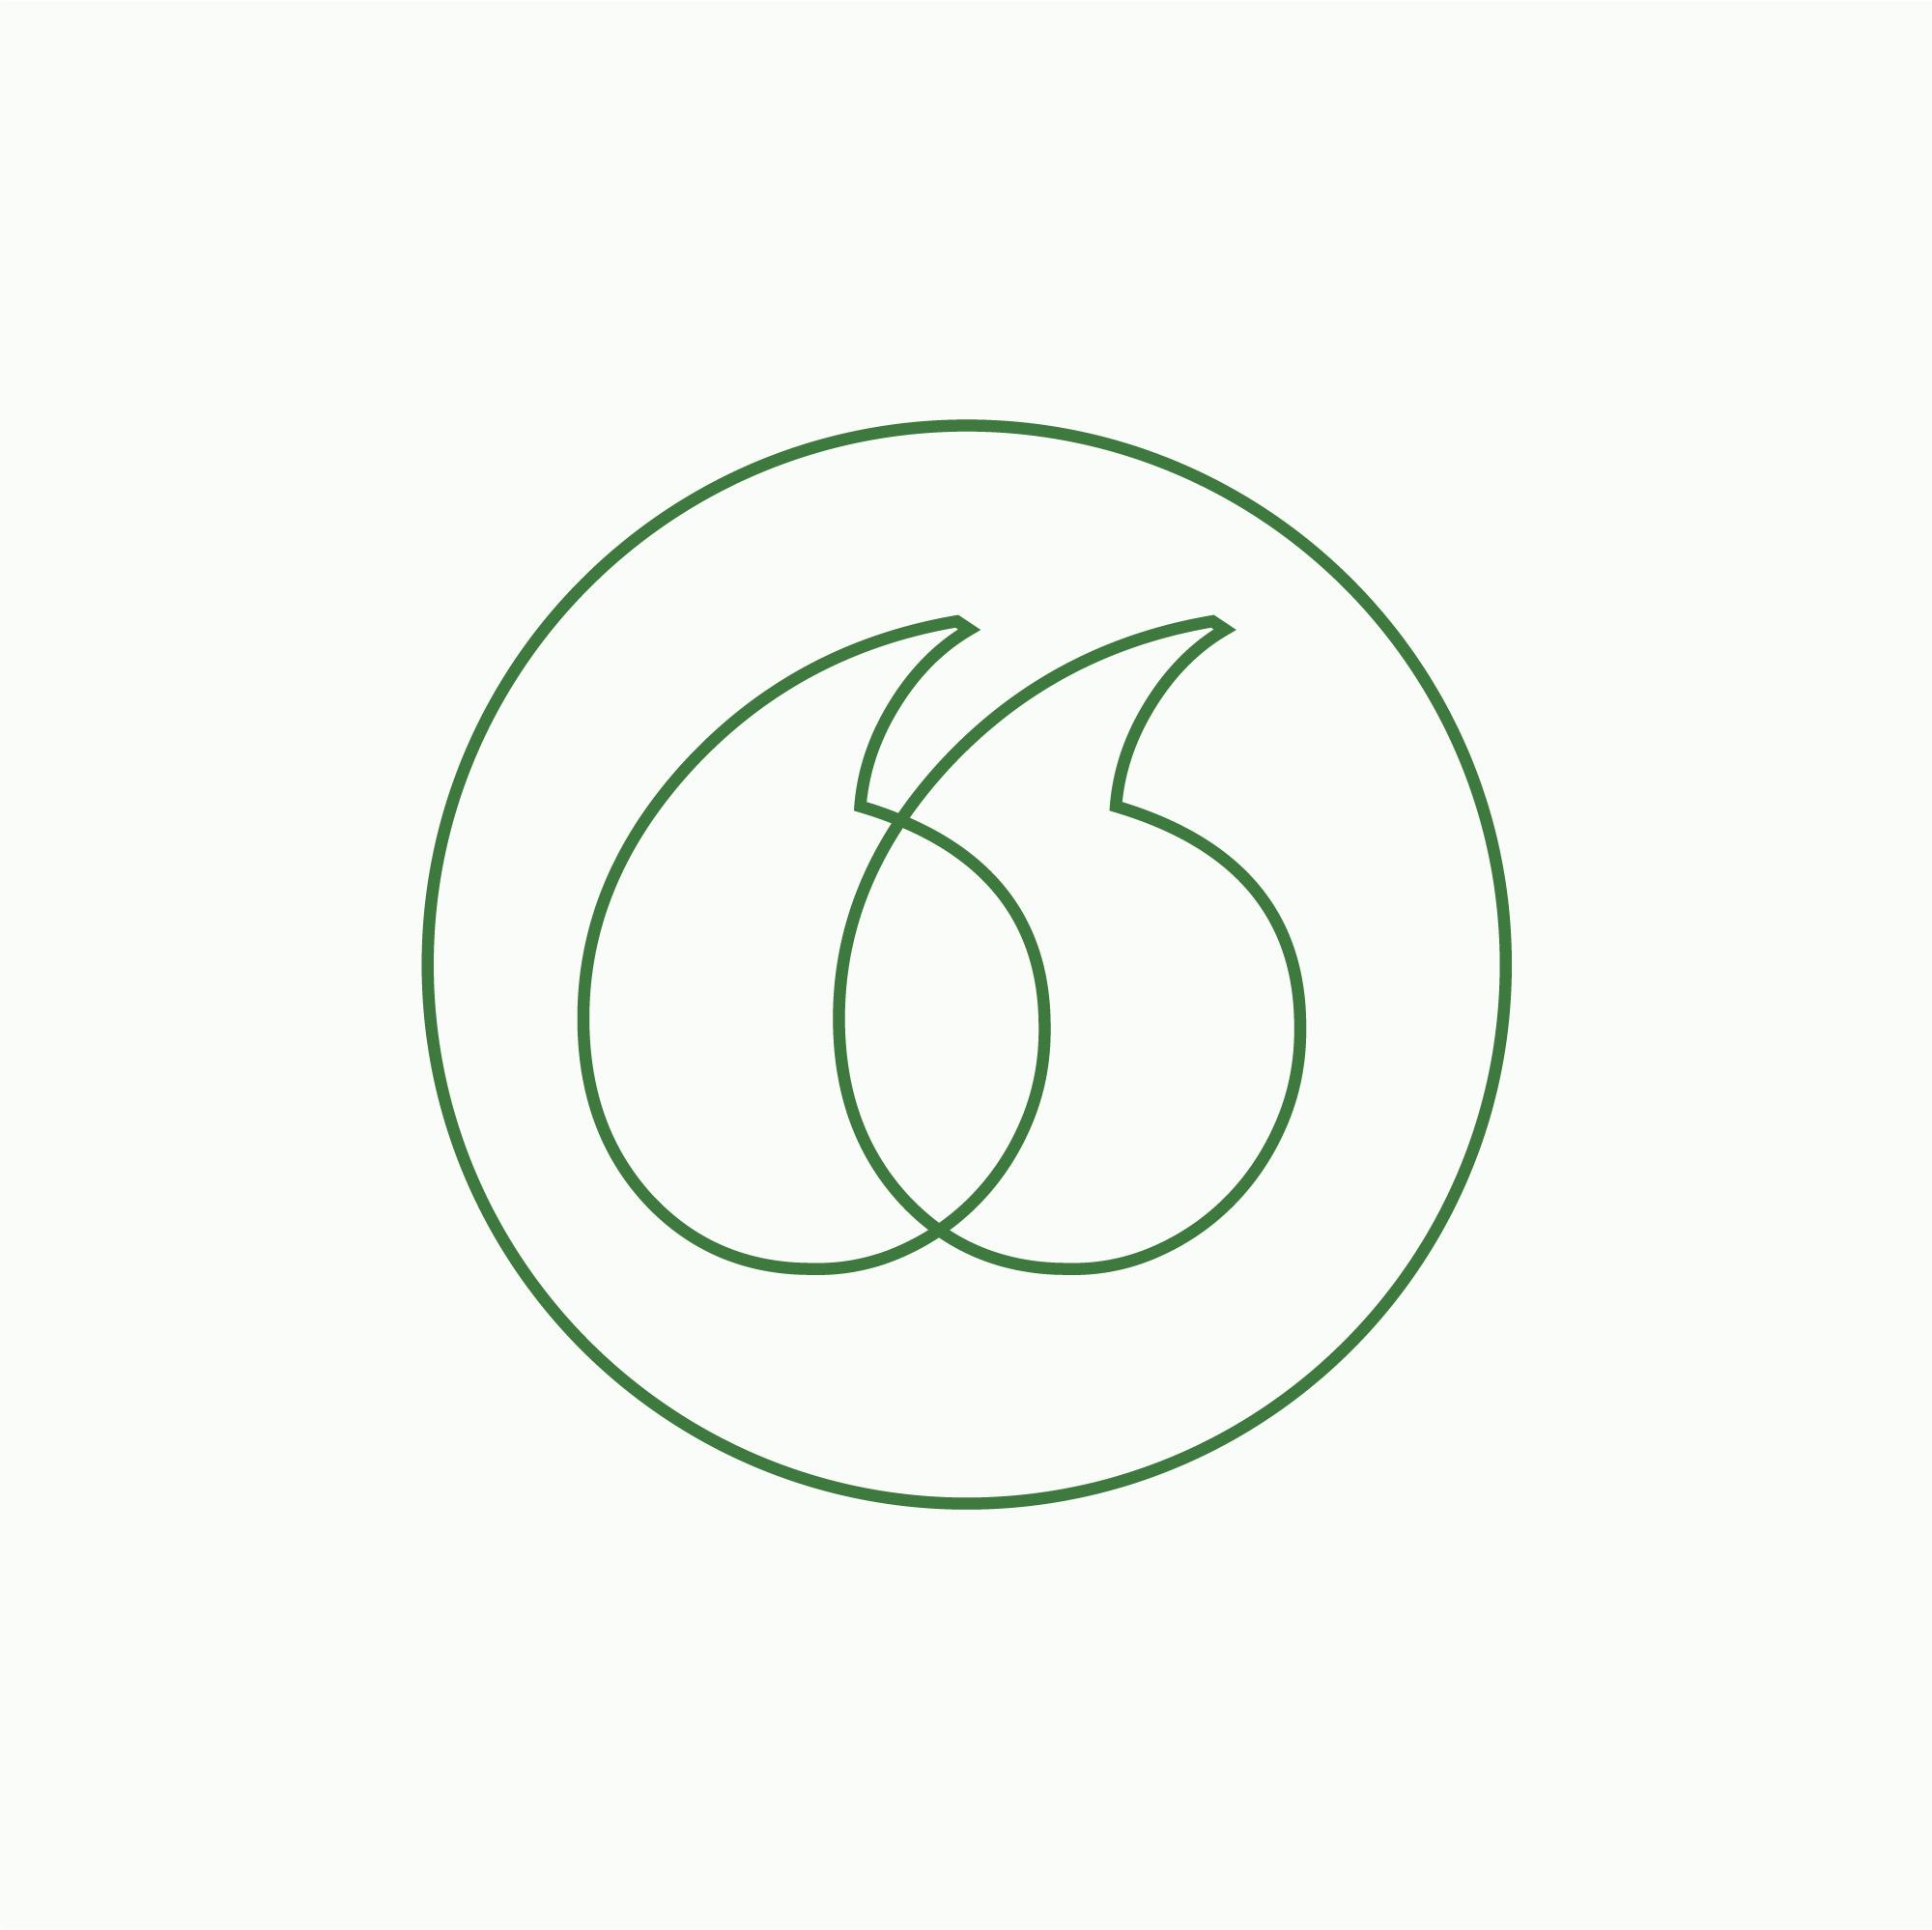 comms co. web design + brand development